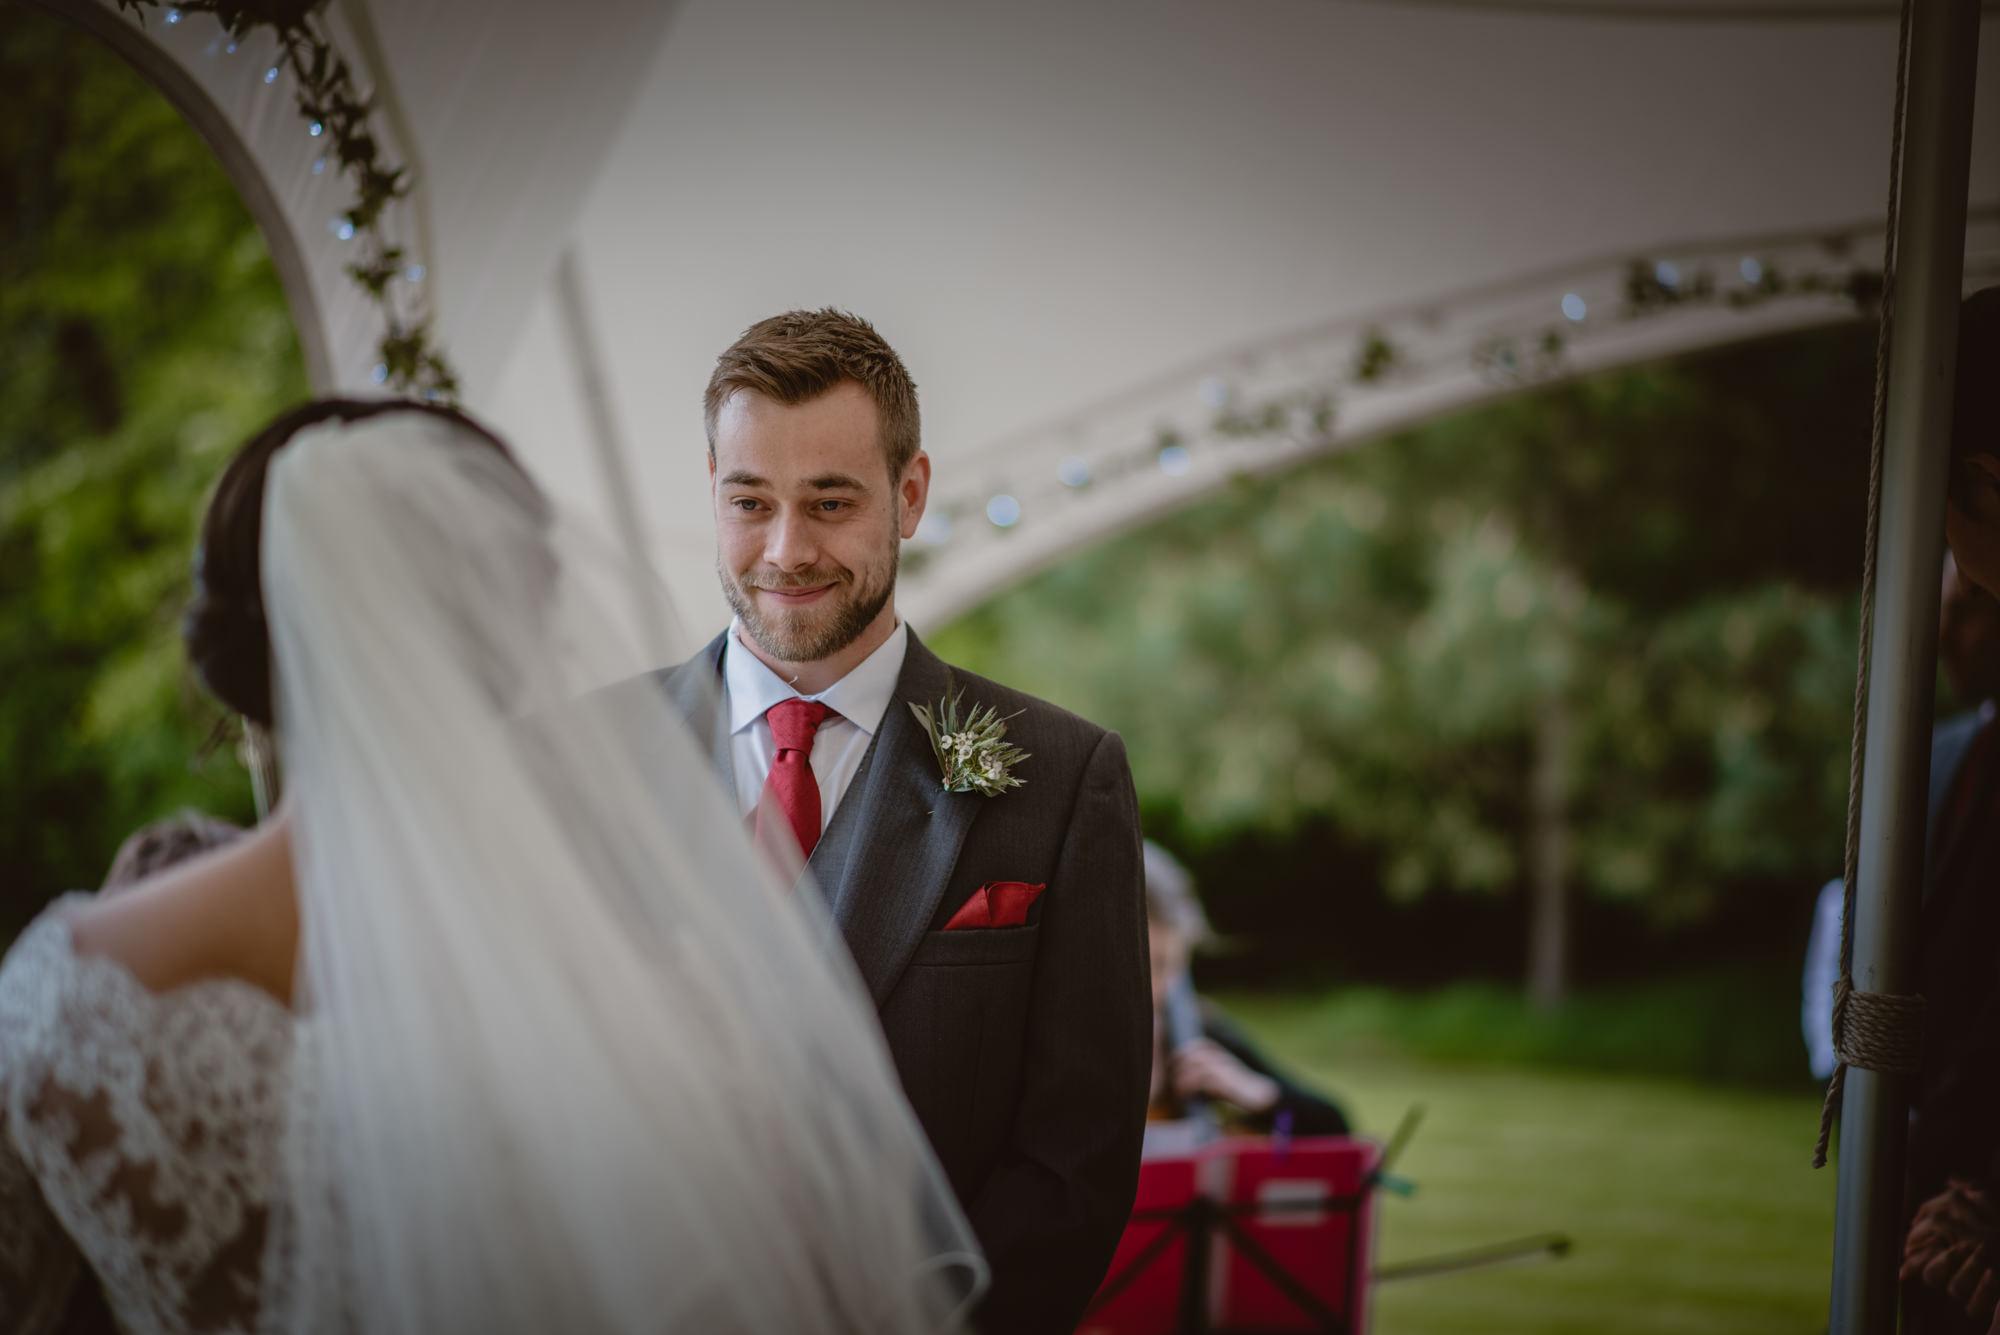 Jacqueline-Gareth-Wedding-Westmead-Events-Surrey-Manu-Mendoza-Wedding-Photography-197.jpg